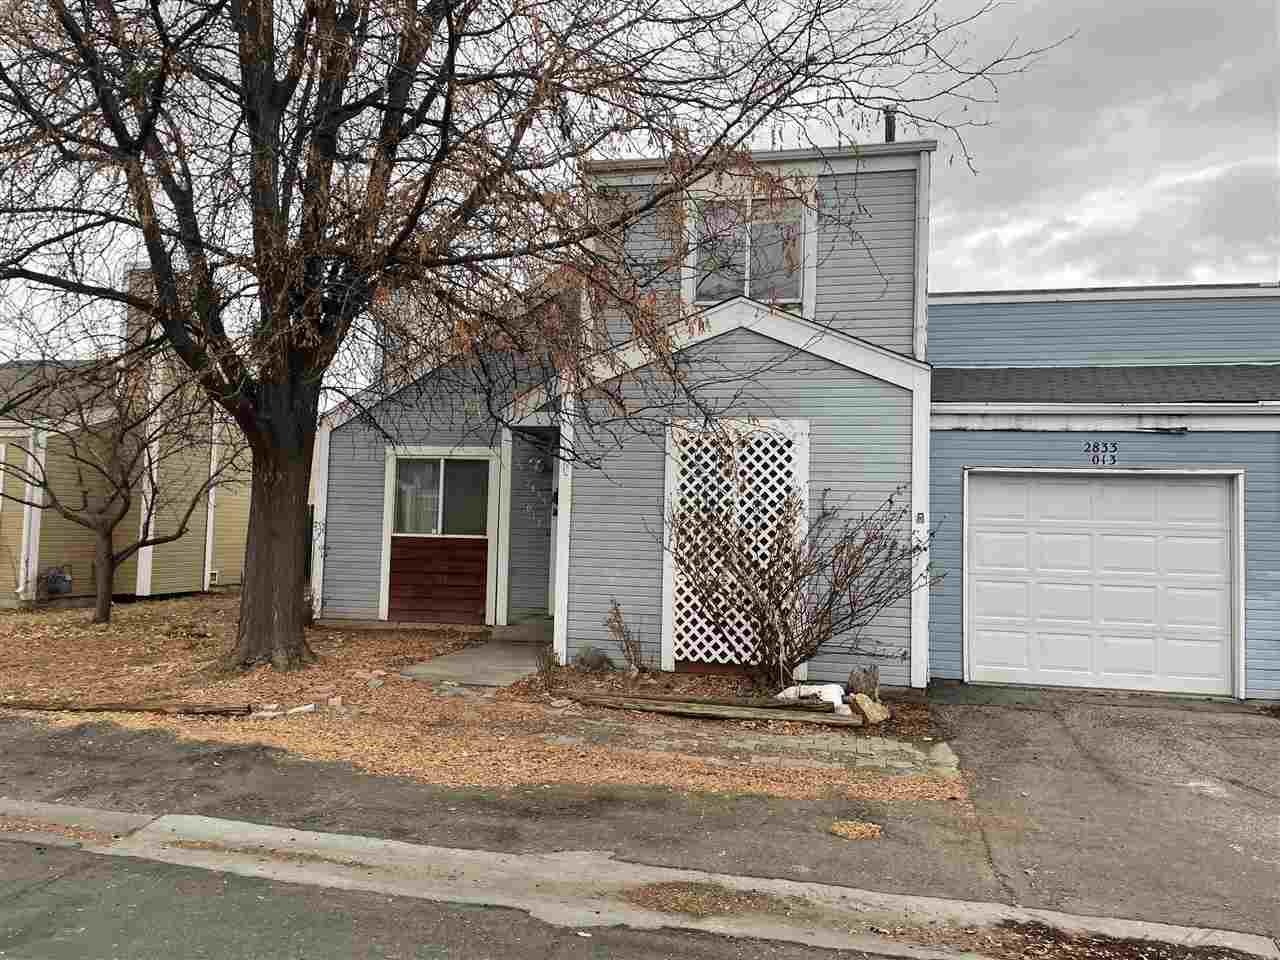 Photo of 2833 Quincy Court #13, Grand Junction, CO 81503 (MLS # 20210271)